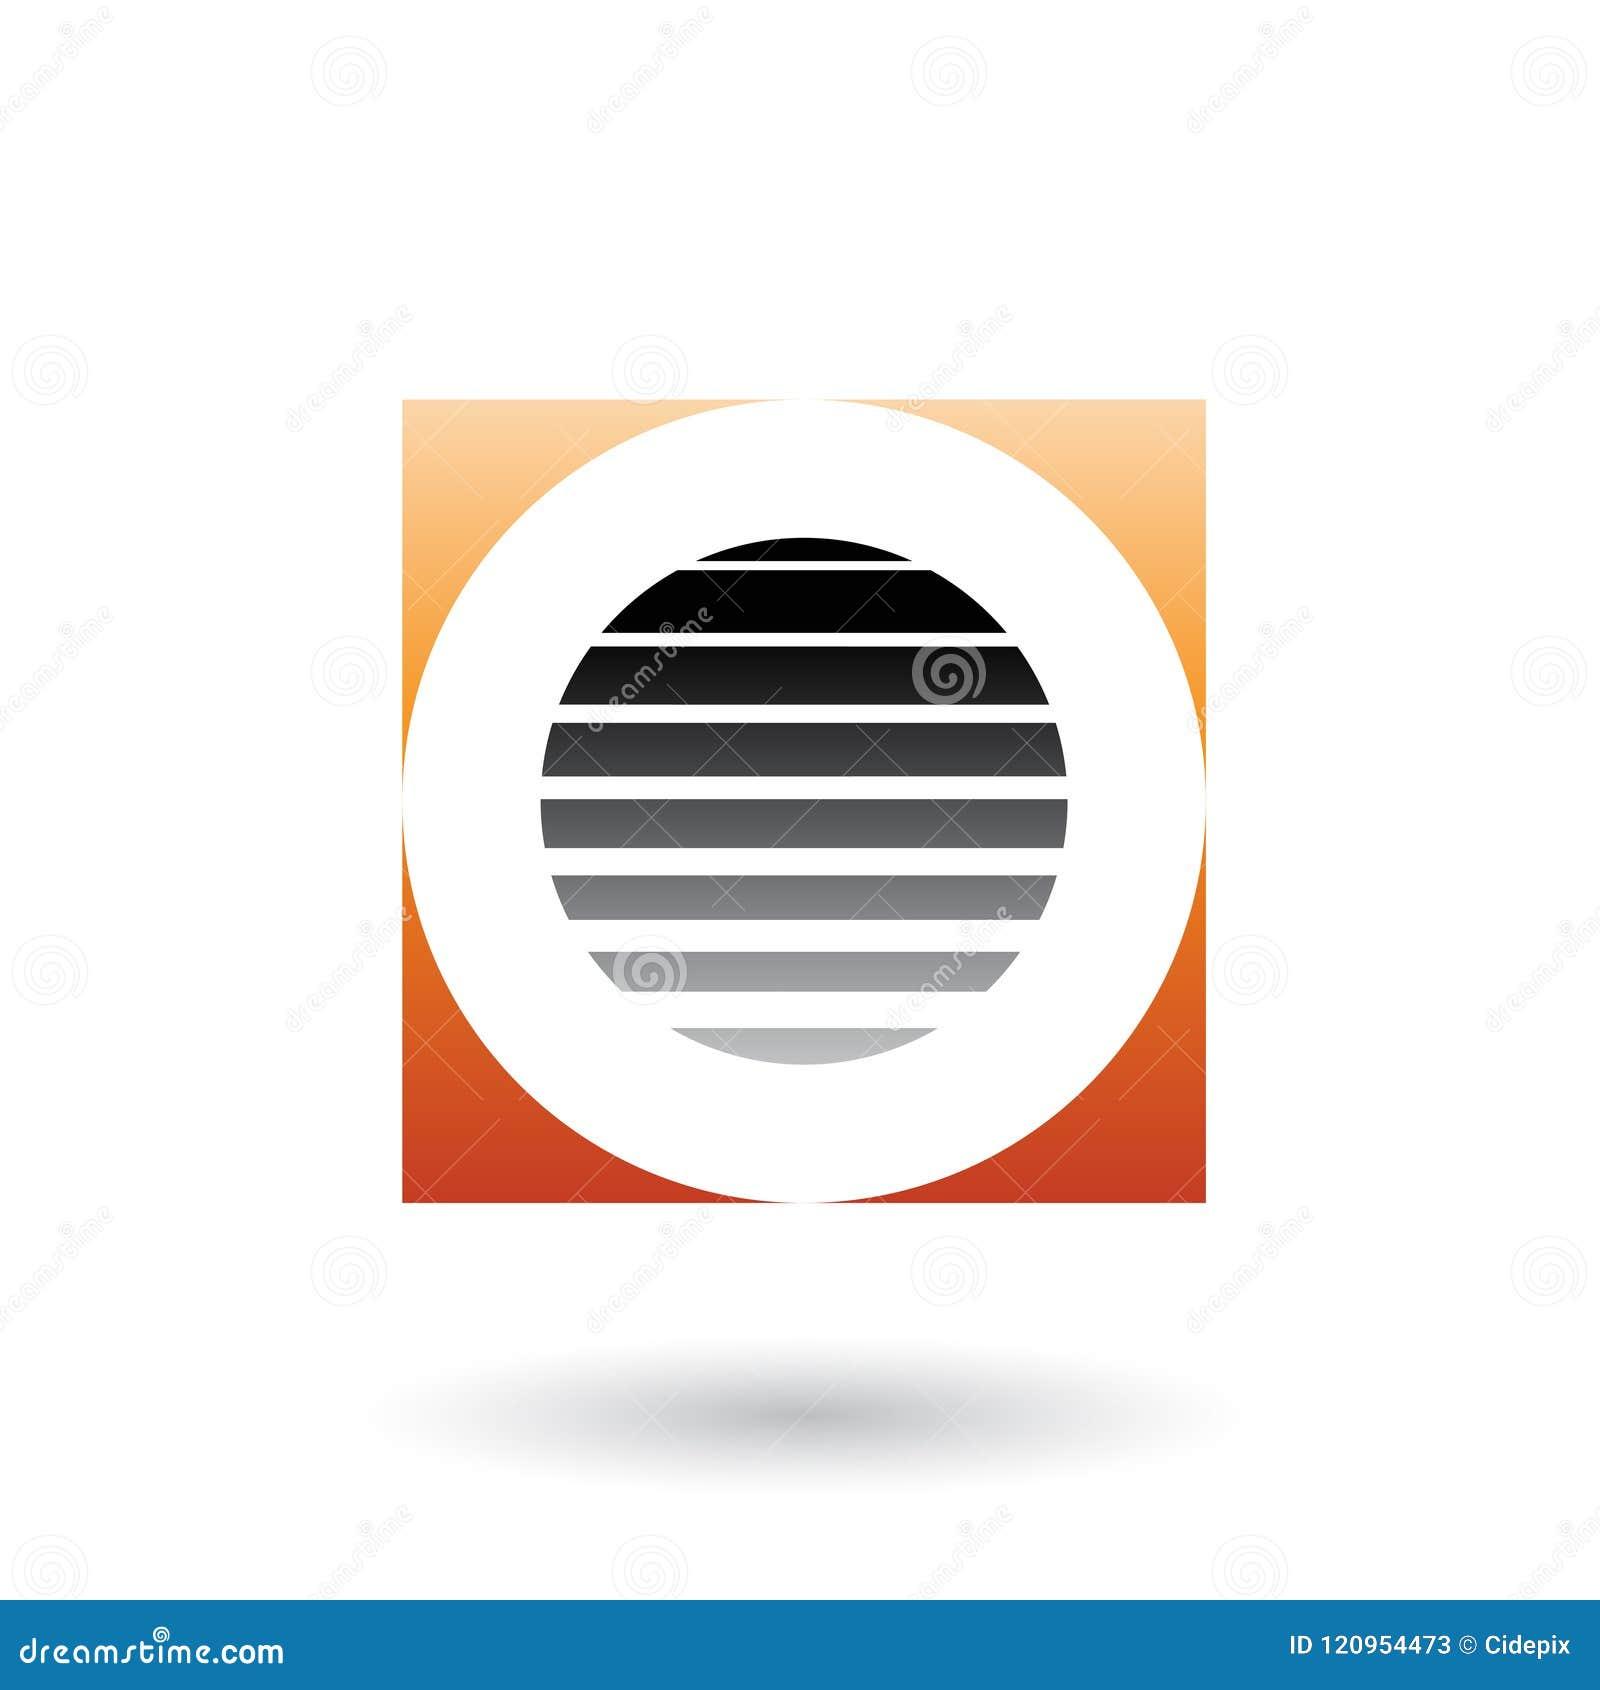 Striped Square Orange And Black Icon For Letter O Vector